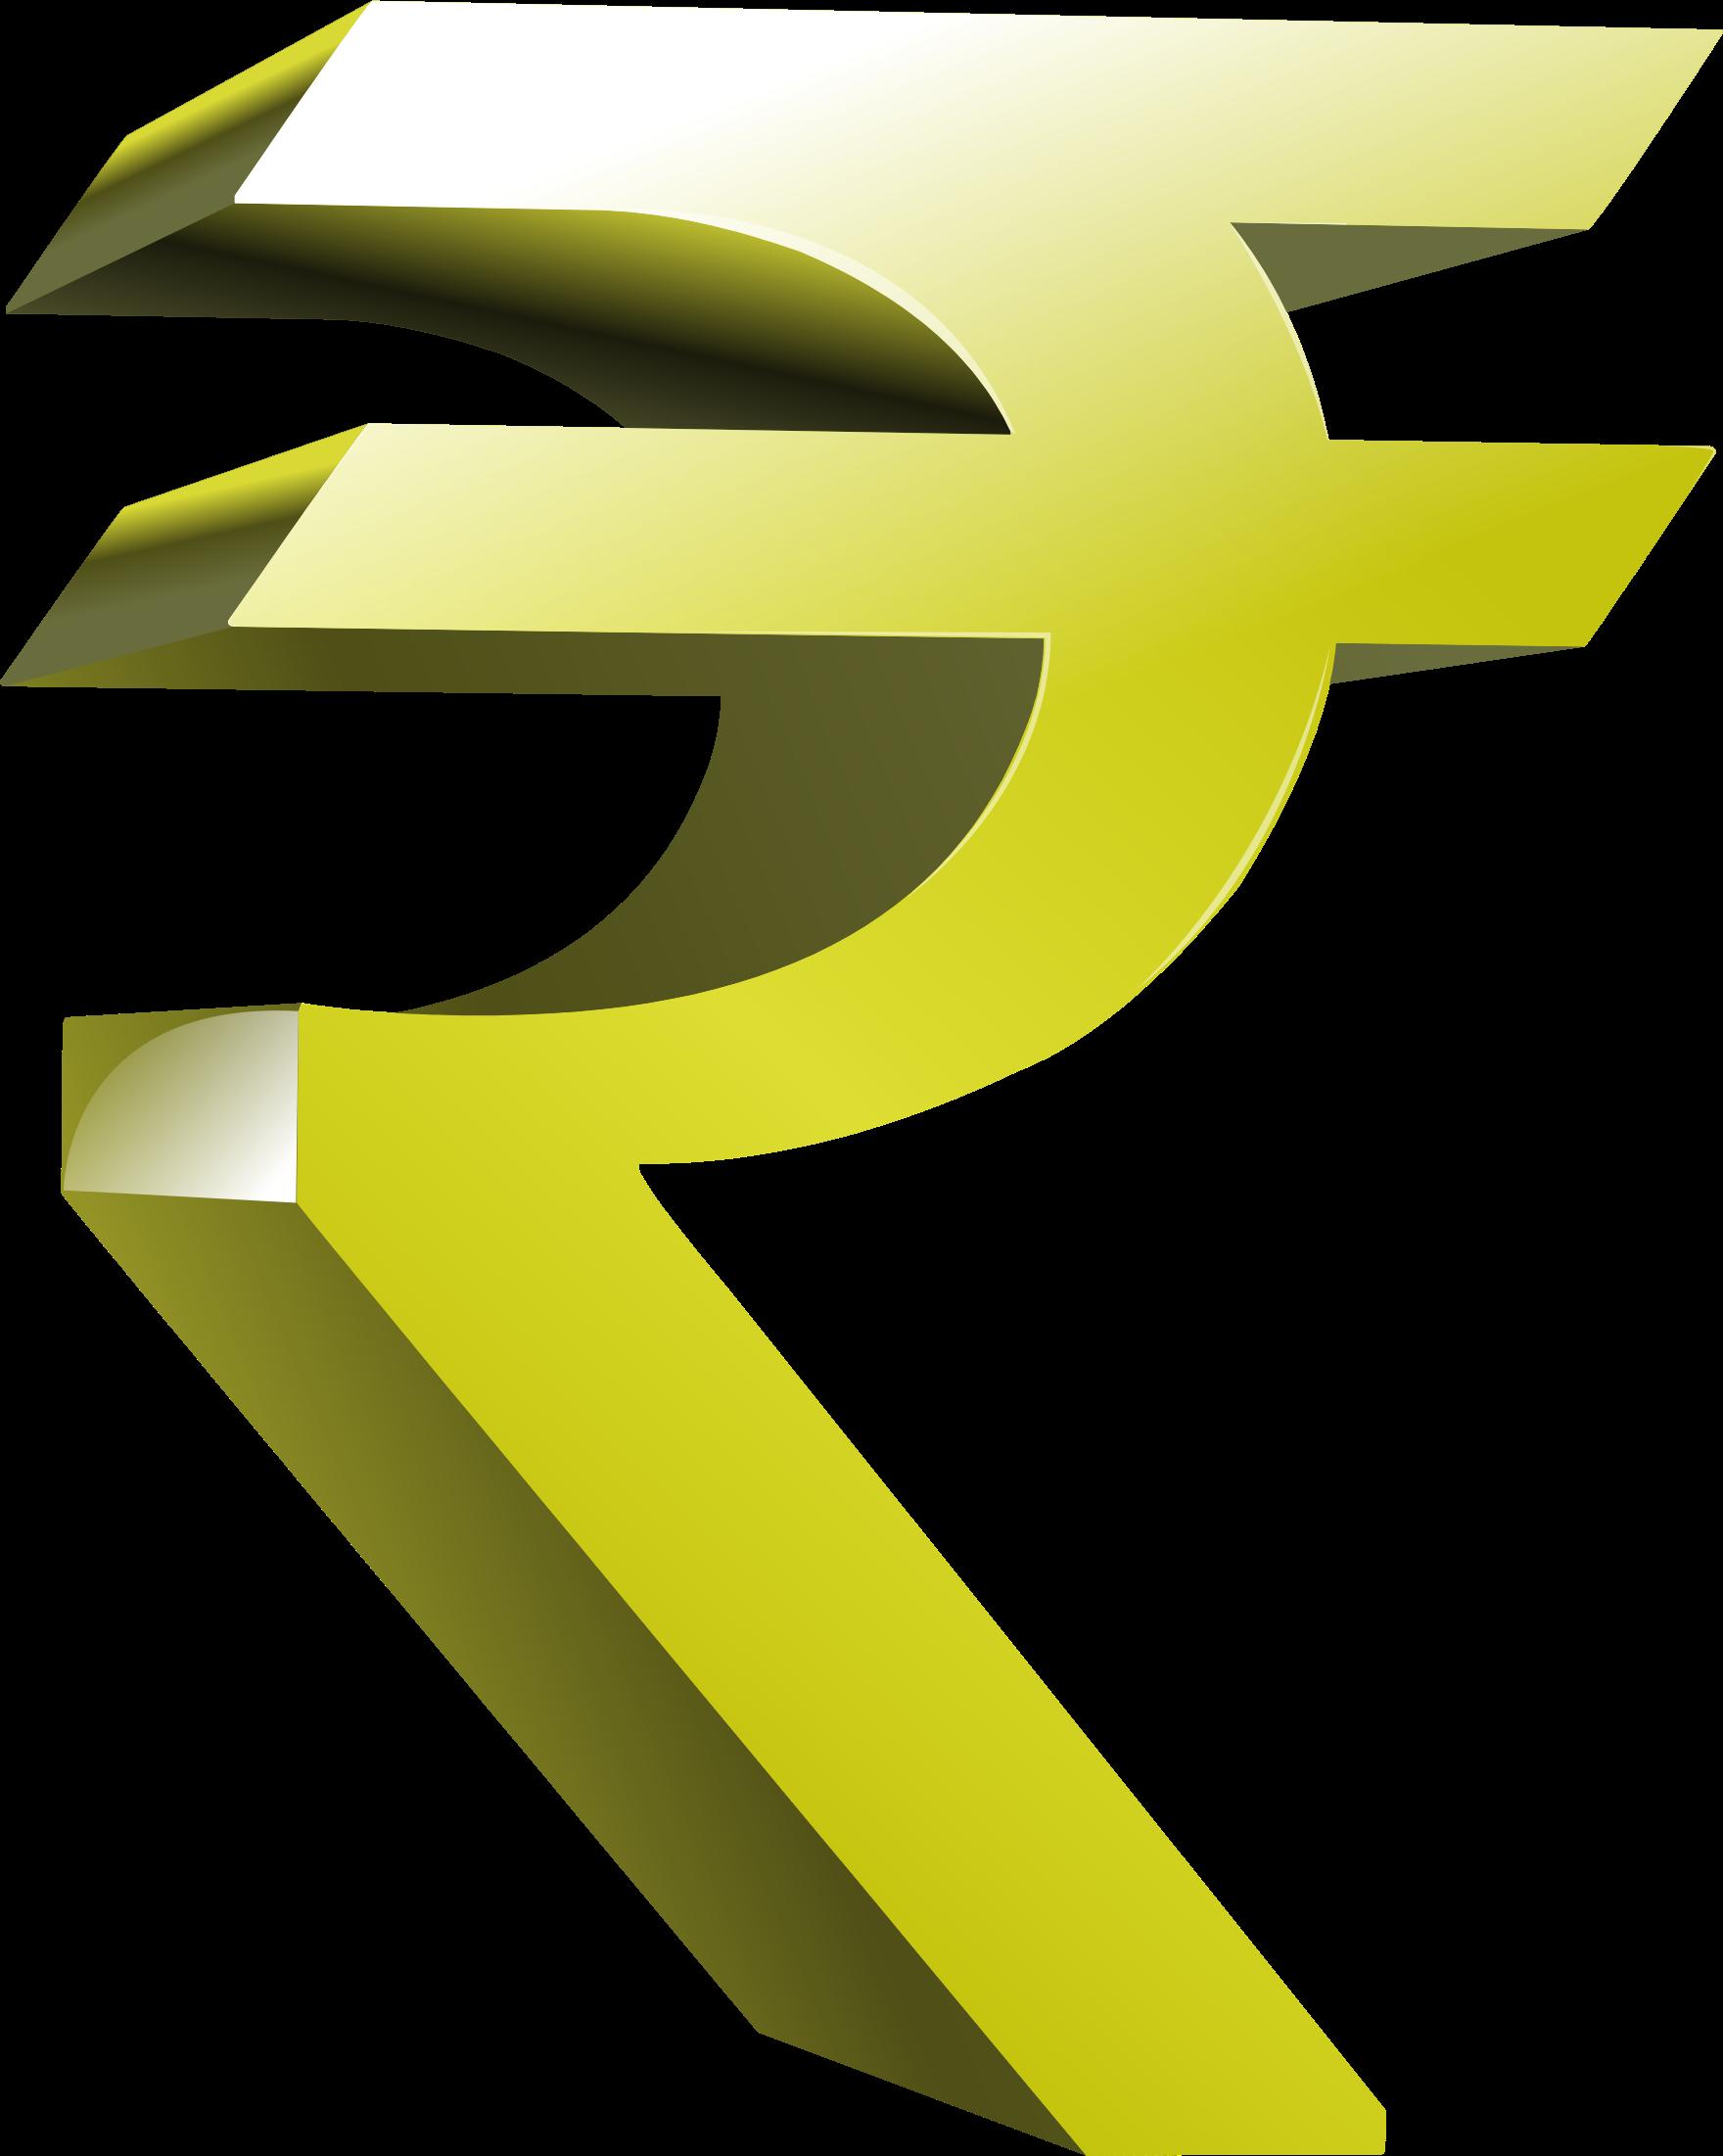 Download Rupee Symbol Transparent Hq Png Image Freepngimg